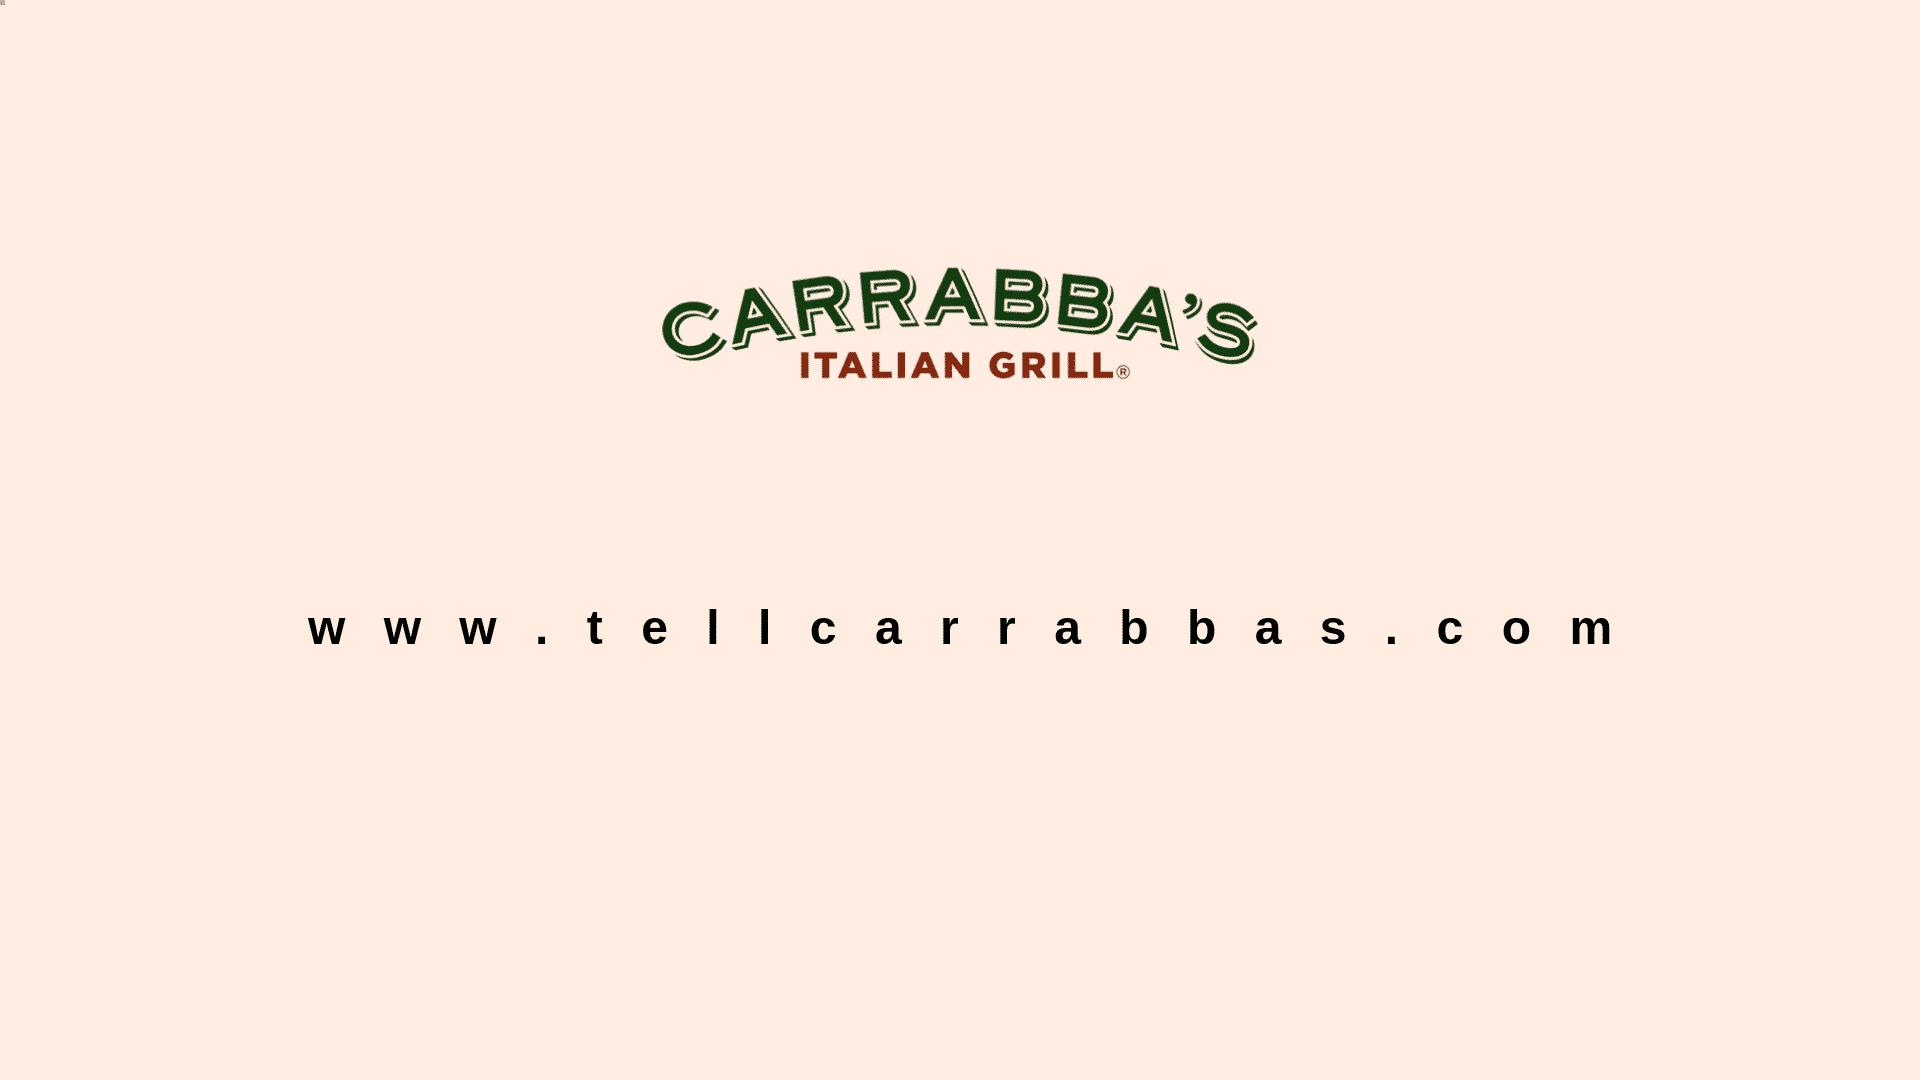 tellcarrabbas